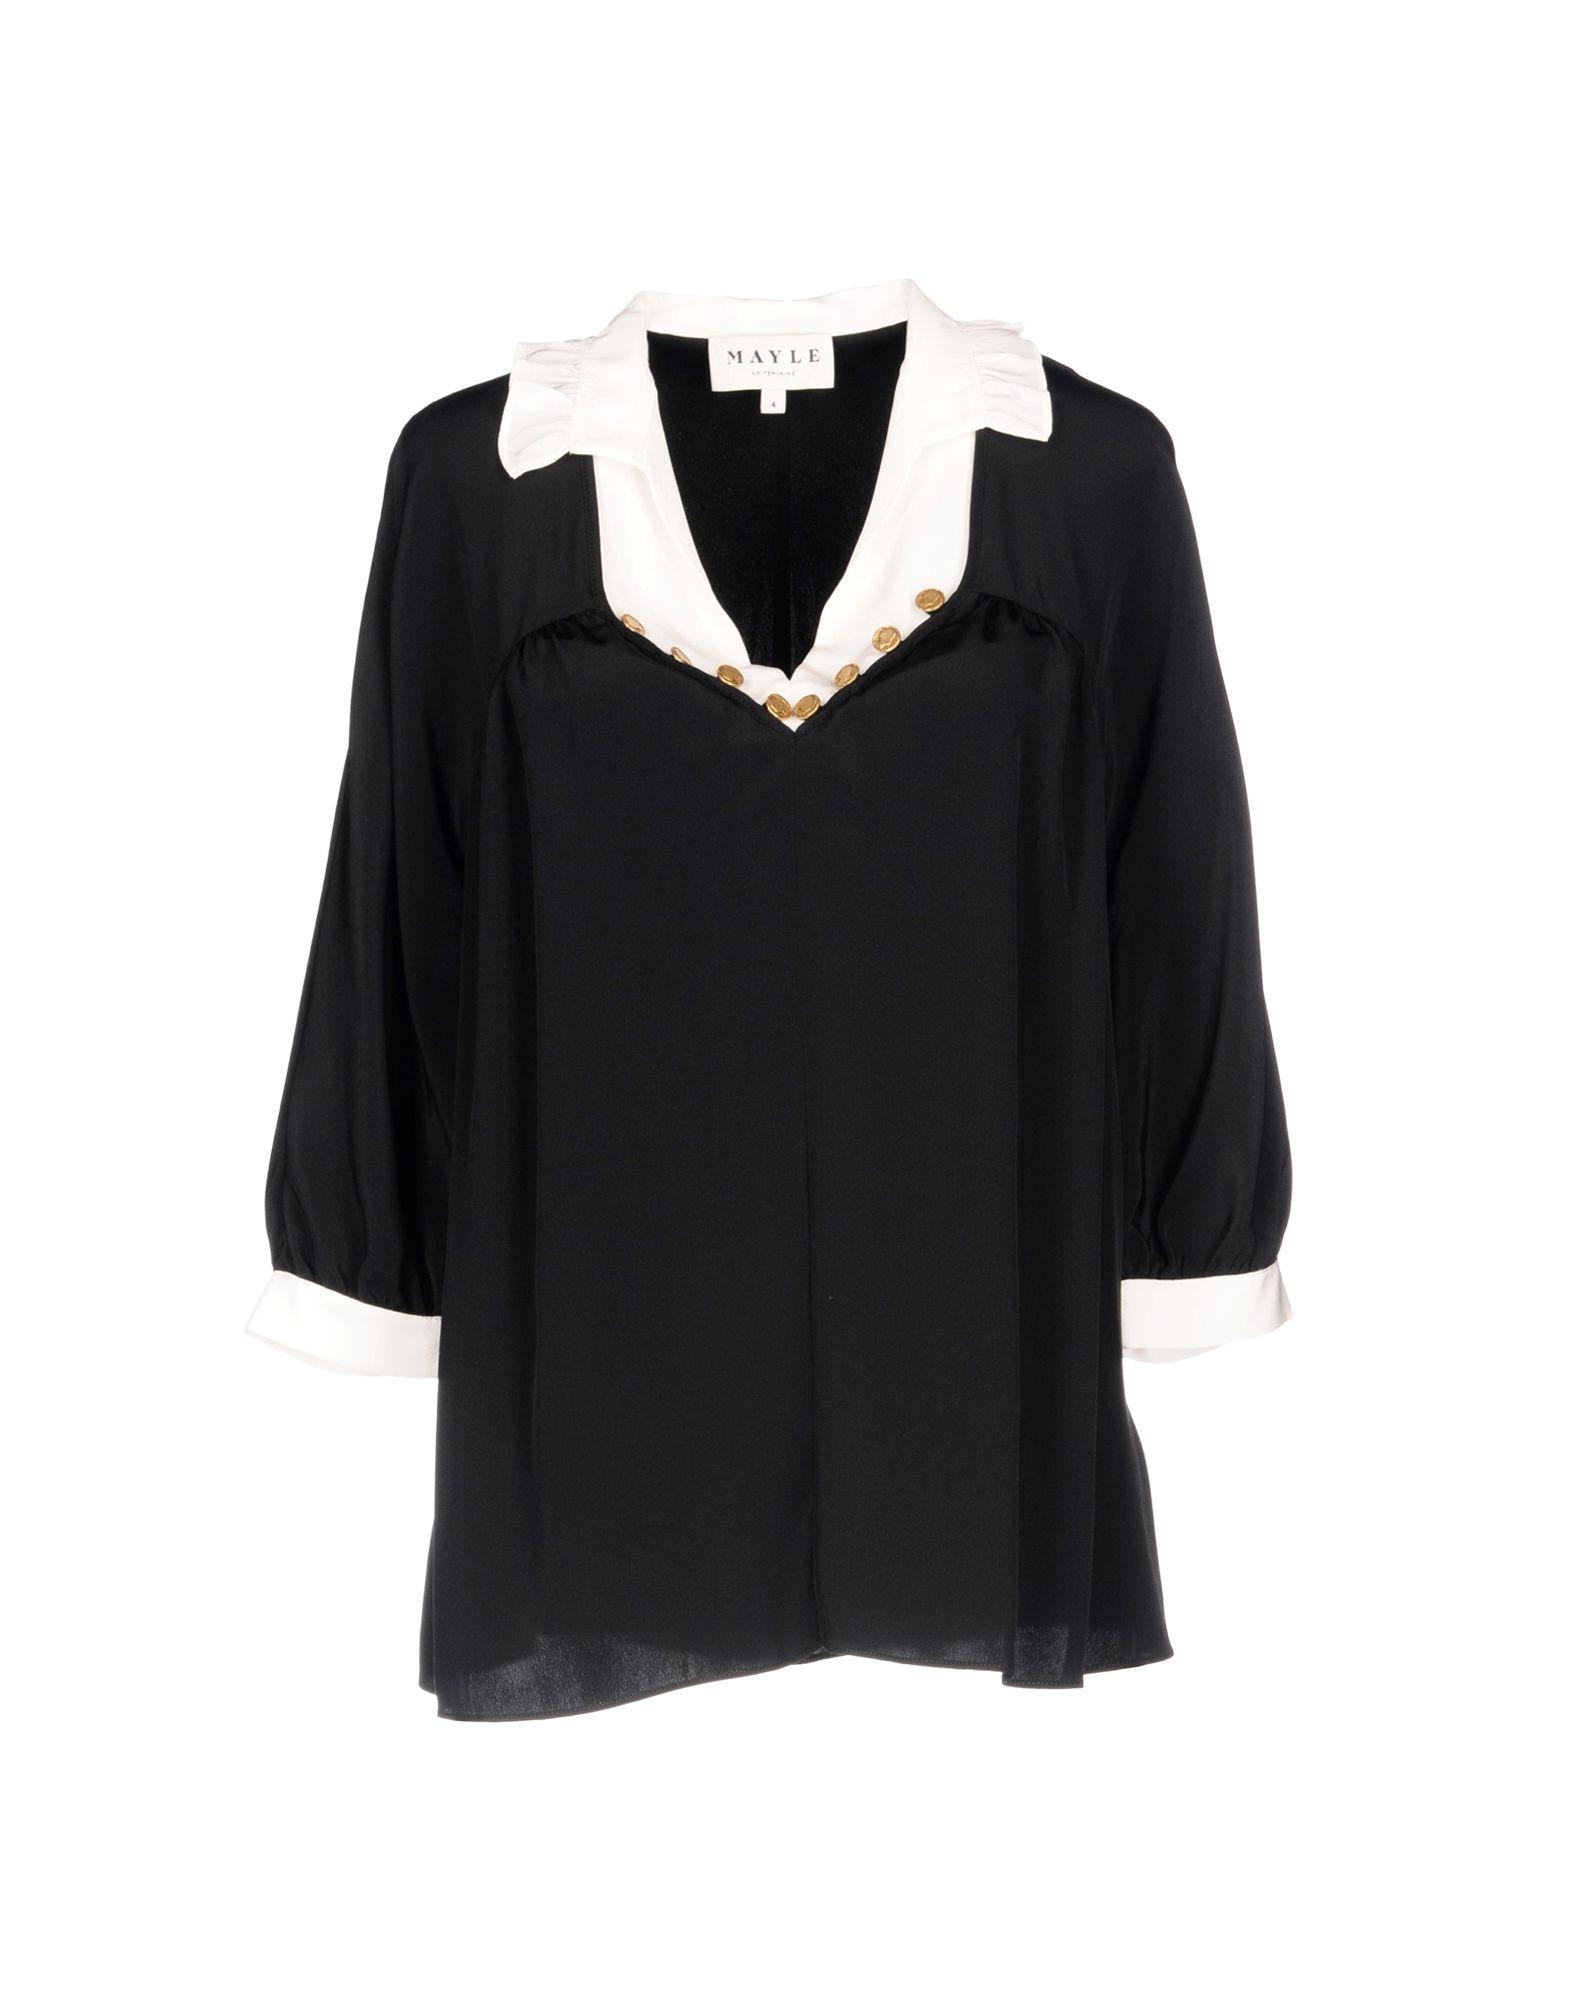 MAYLE Блузка mayle блузка